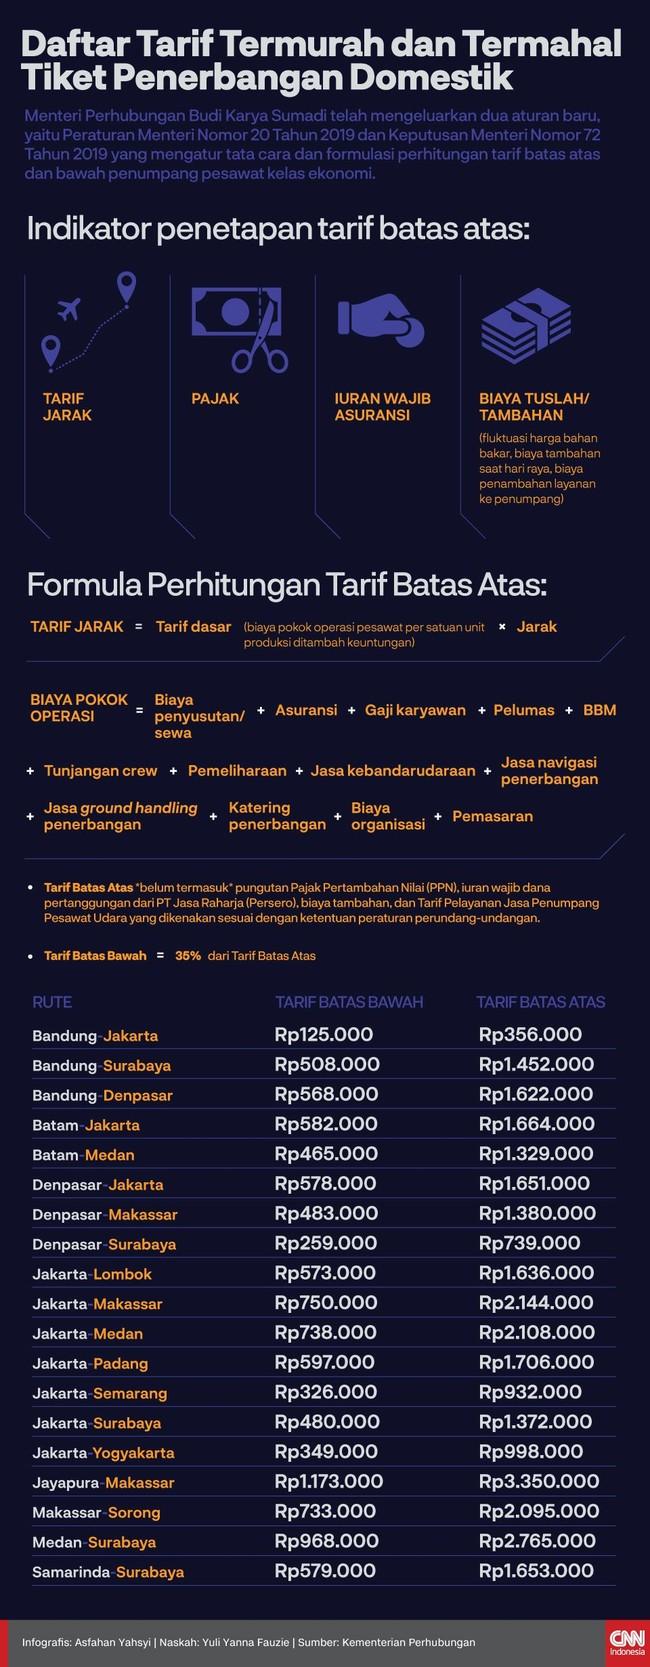 Infografis Daftar Lengkap Harga Tiket Penerbangan Domestik